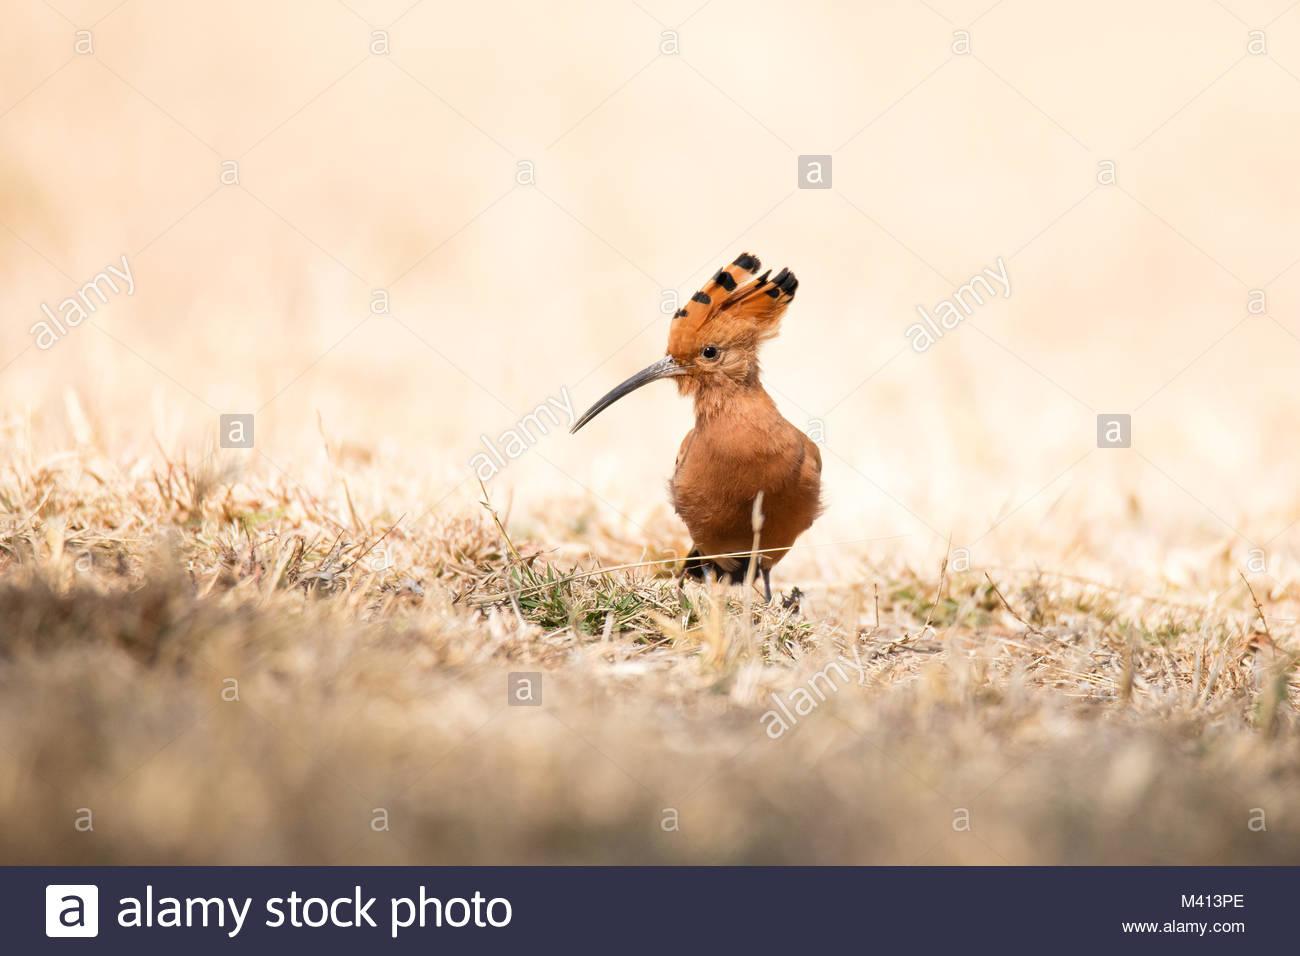 Afrikanischer Wiedehopf - Stock Image